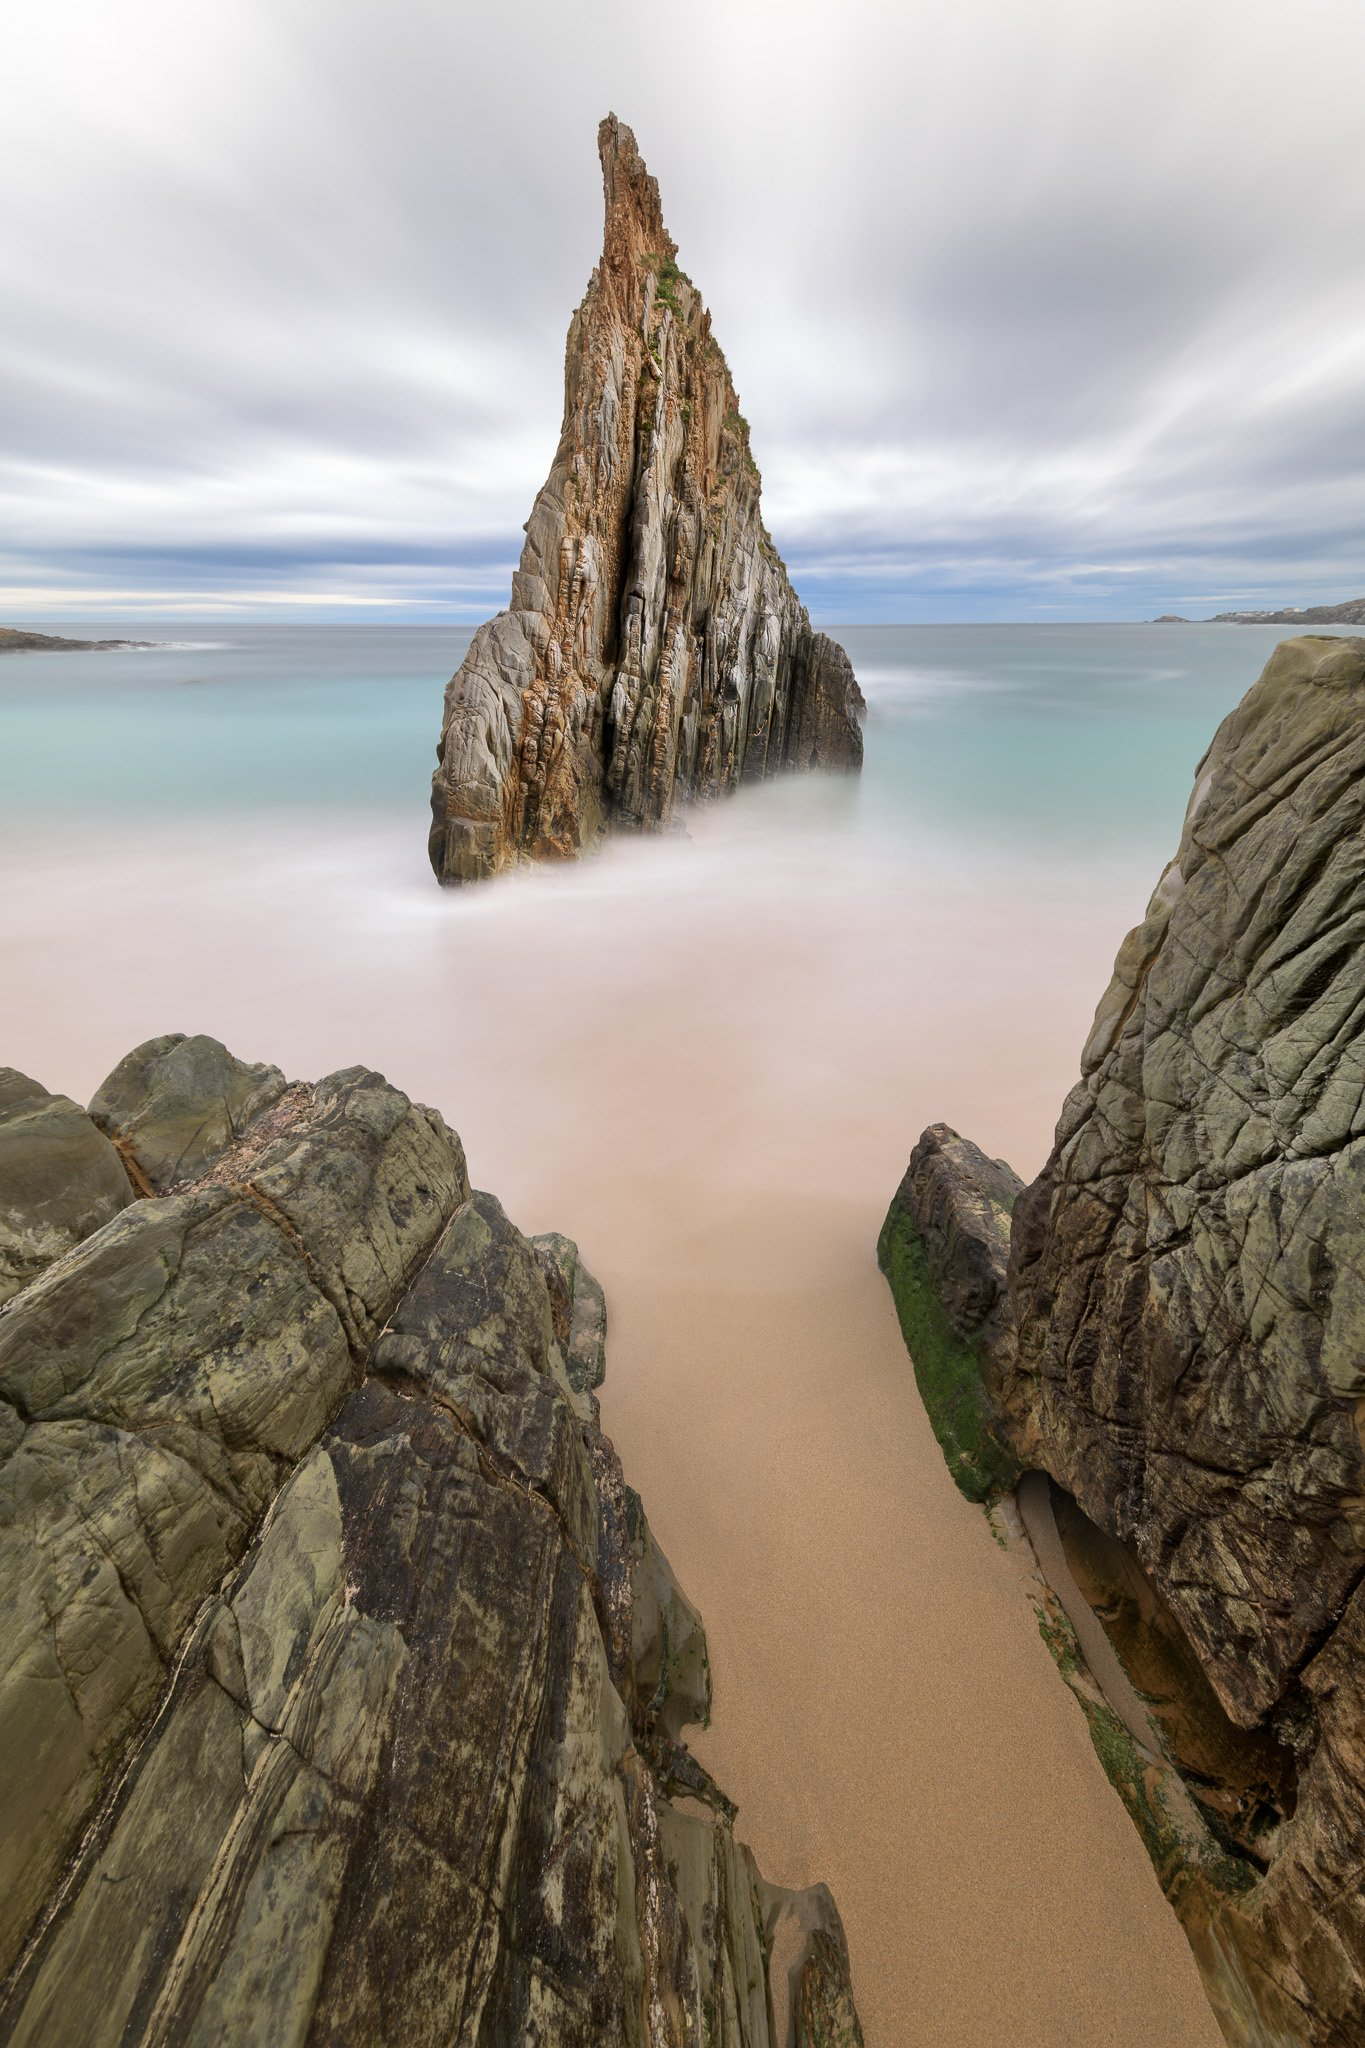 asturias, atlantic, beach, blue, cliff, cloud, coast, coastline, dawn, edged, europe, idyllic, landmark, landscape, mexota, morning, natural, nature, needle, obelisk, ocean, outdoor, pointed, rock, rocky, sand, sandy, scenery, scenic, sea, seascape, seasi, anshar